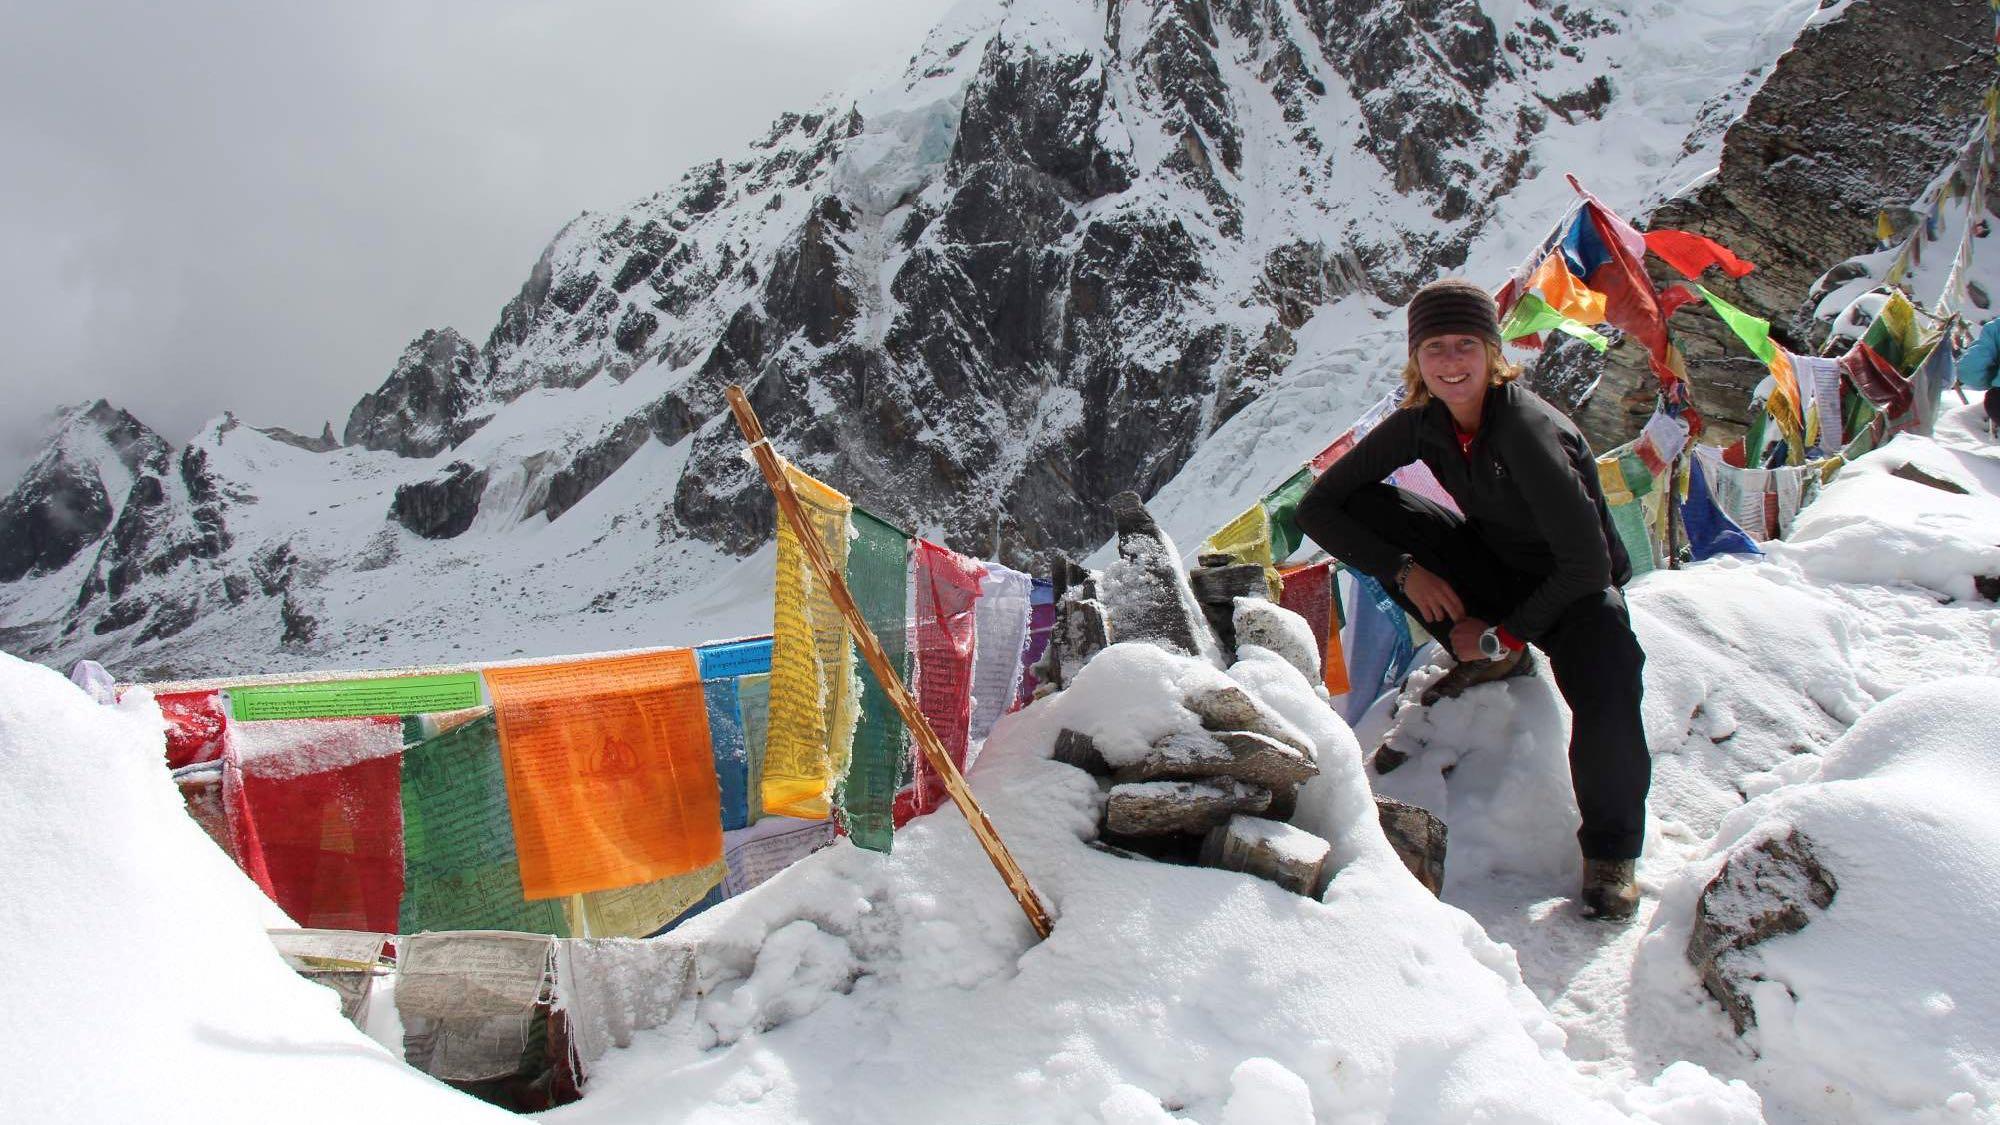 The Snowman trek in Bhutan - Photo: Veronika  Švecová